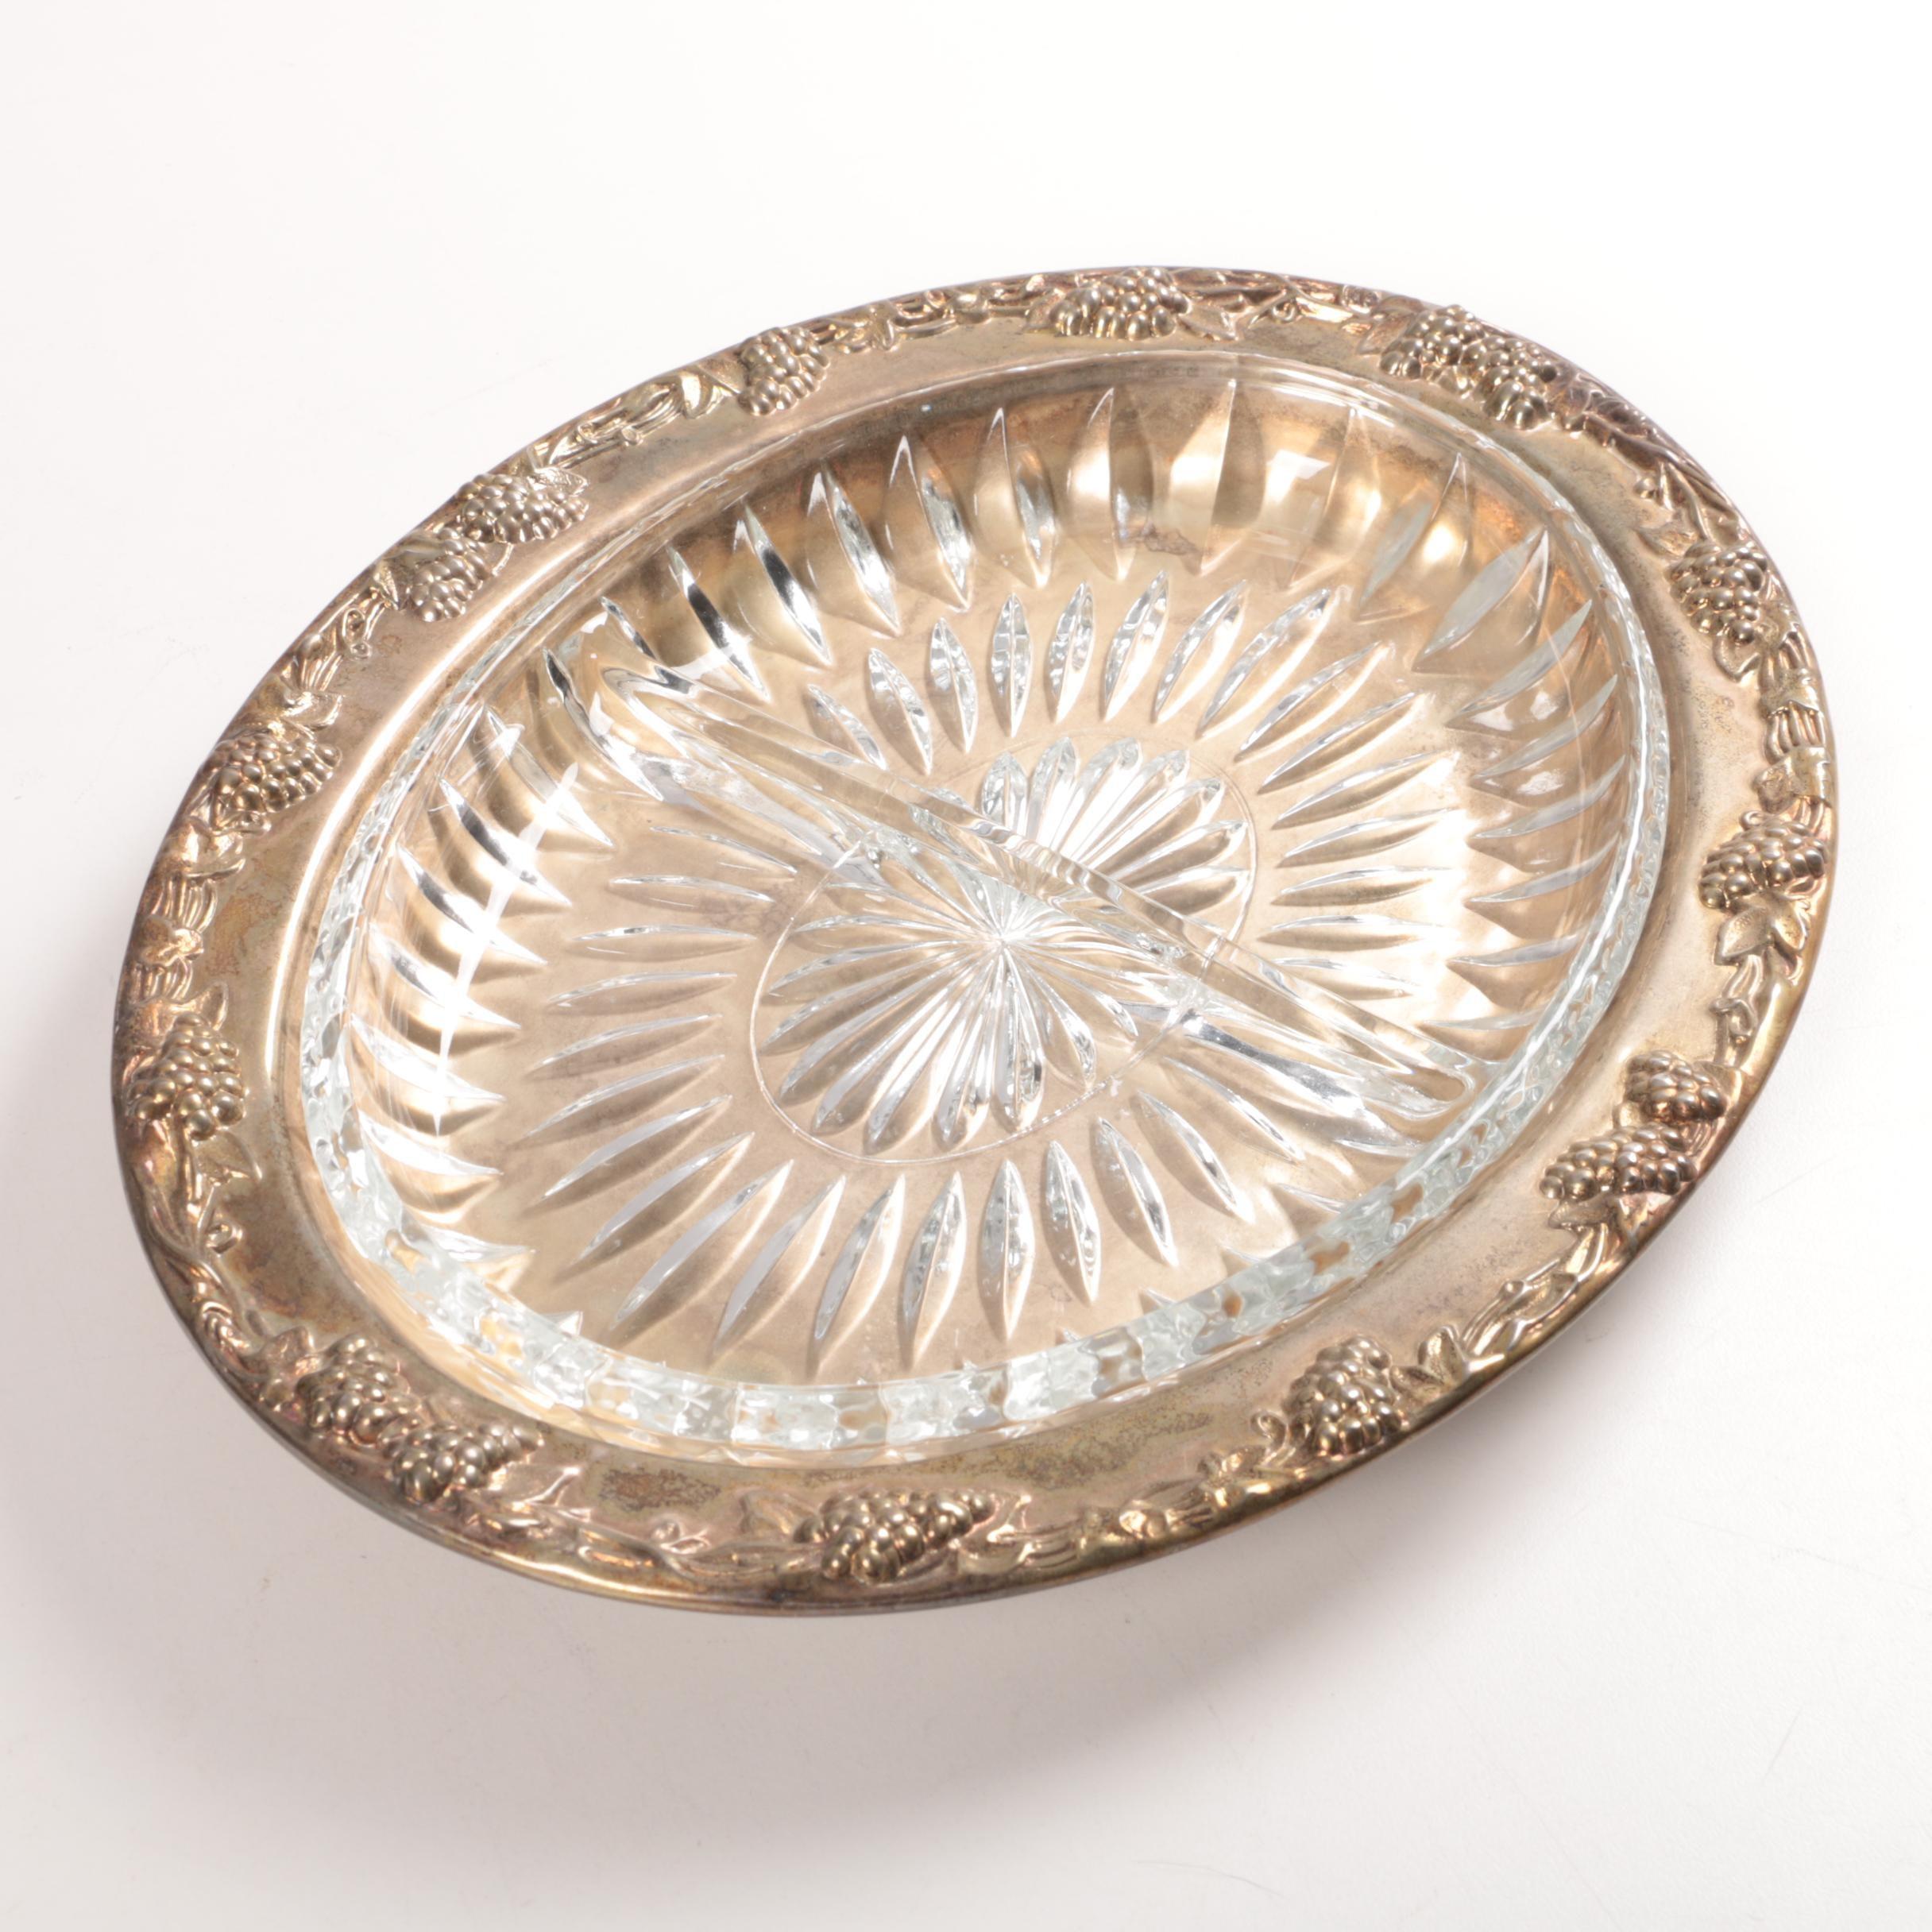 "Sheridan Taunton Silversmiths Ltd. ""Vintage"" Serving Dish with Cut Glass Insert"